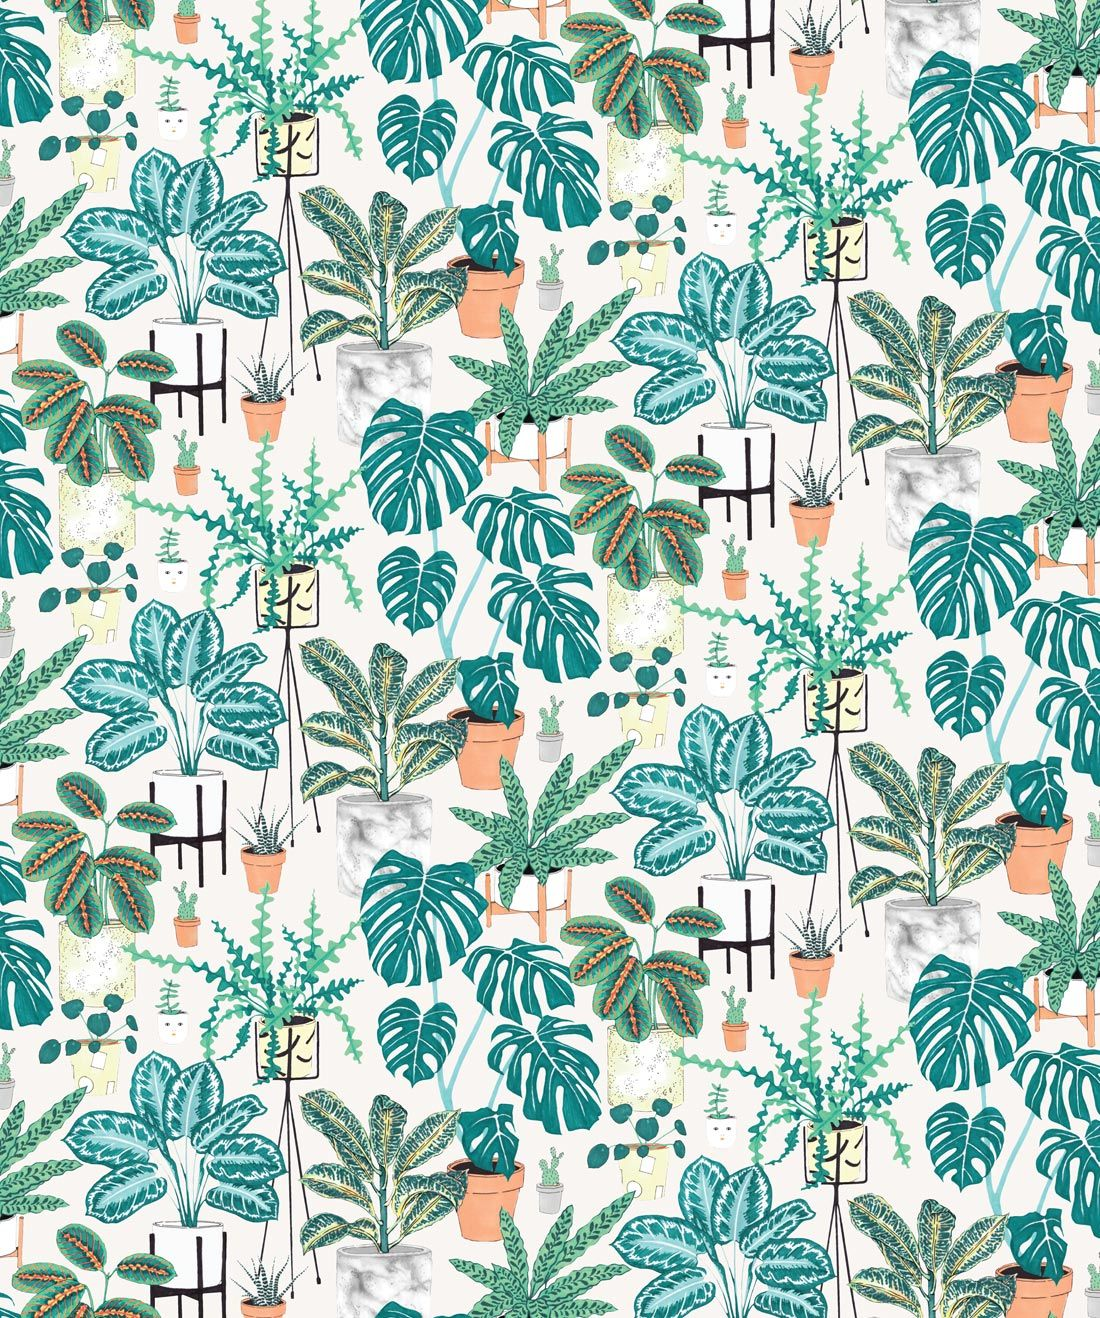 House Plants Wallpaper Sample in 2020 Botanical